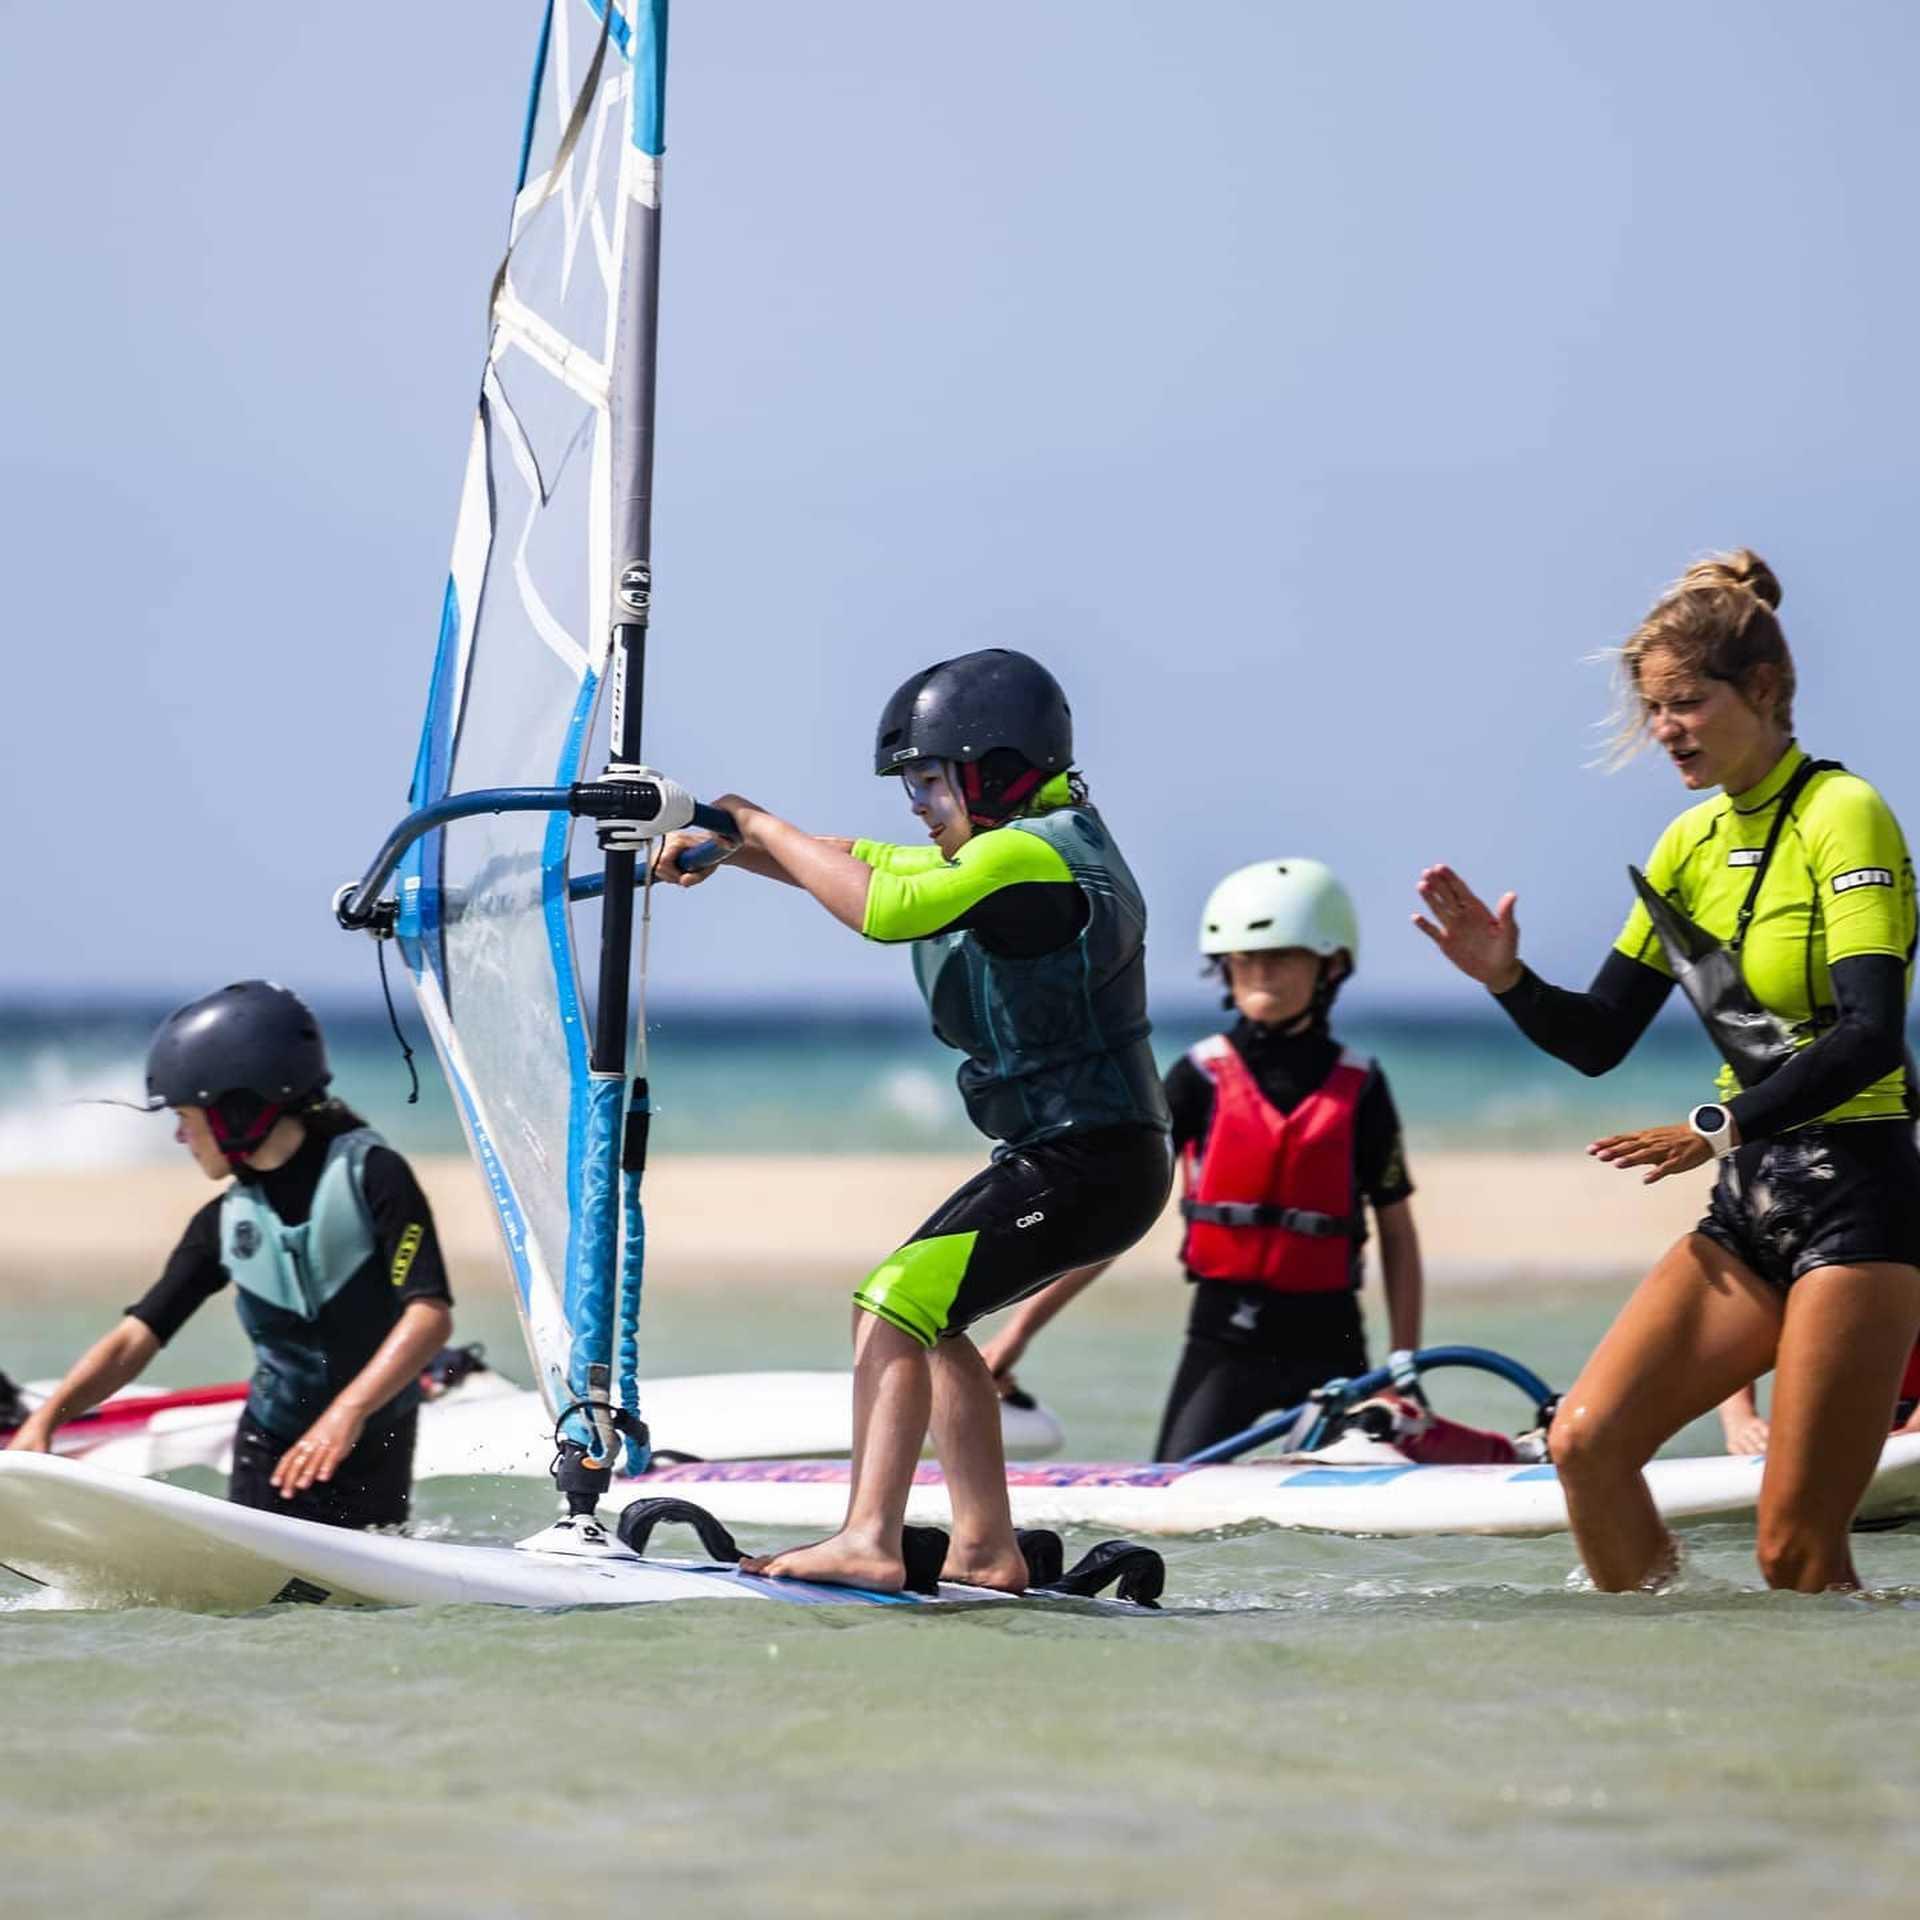 Leçons de windsurf au ION CLUB à RISCO DEL PASO, SOTAVENTO, FUERTEVENTURA